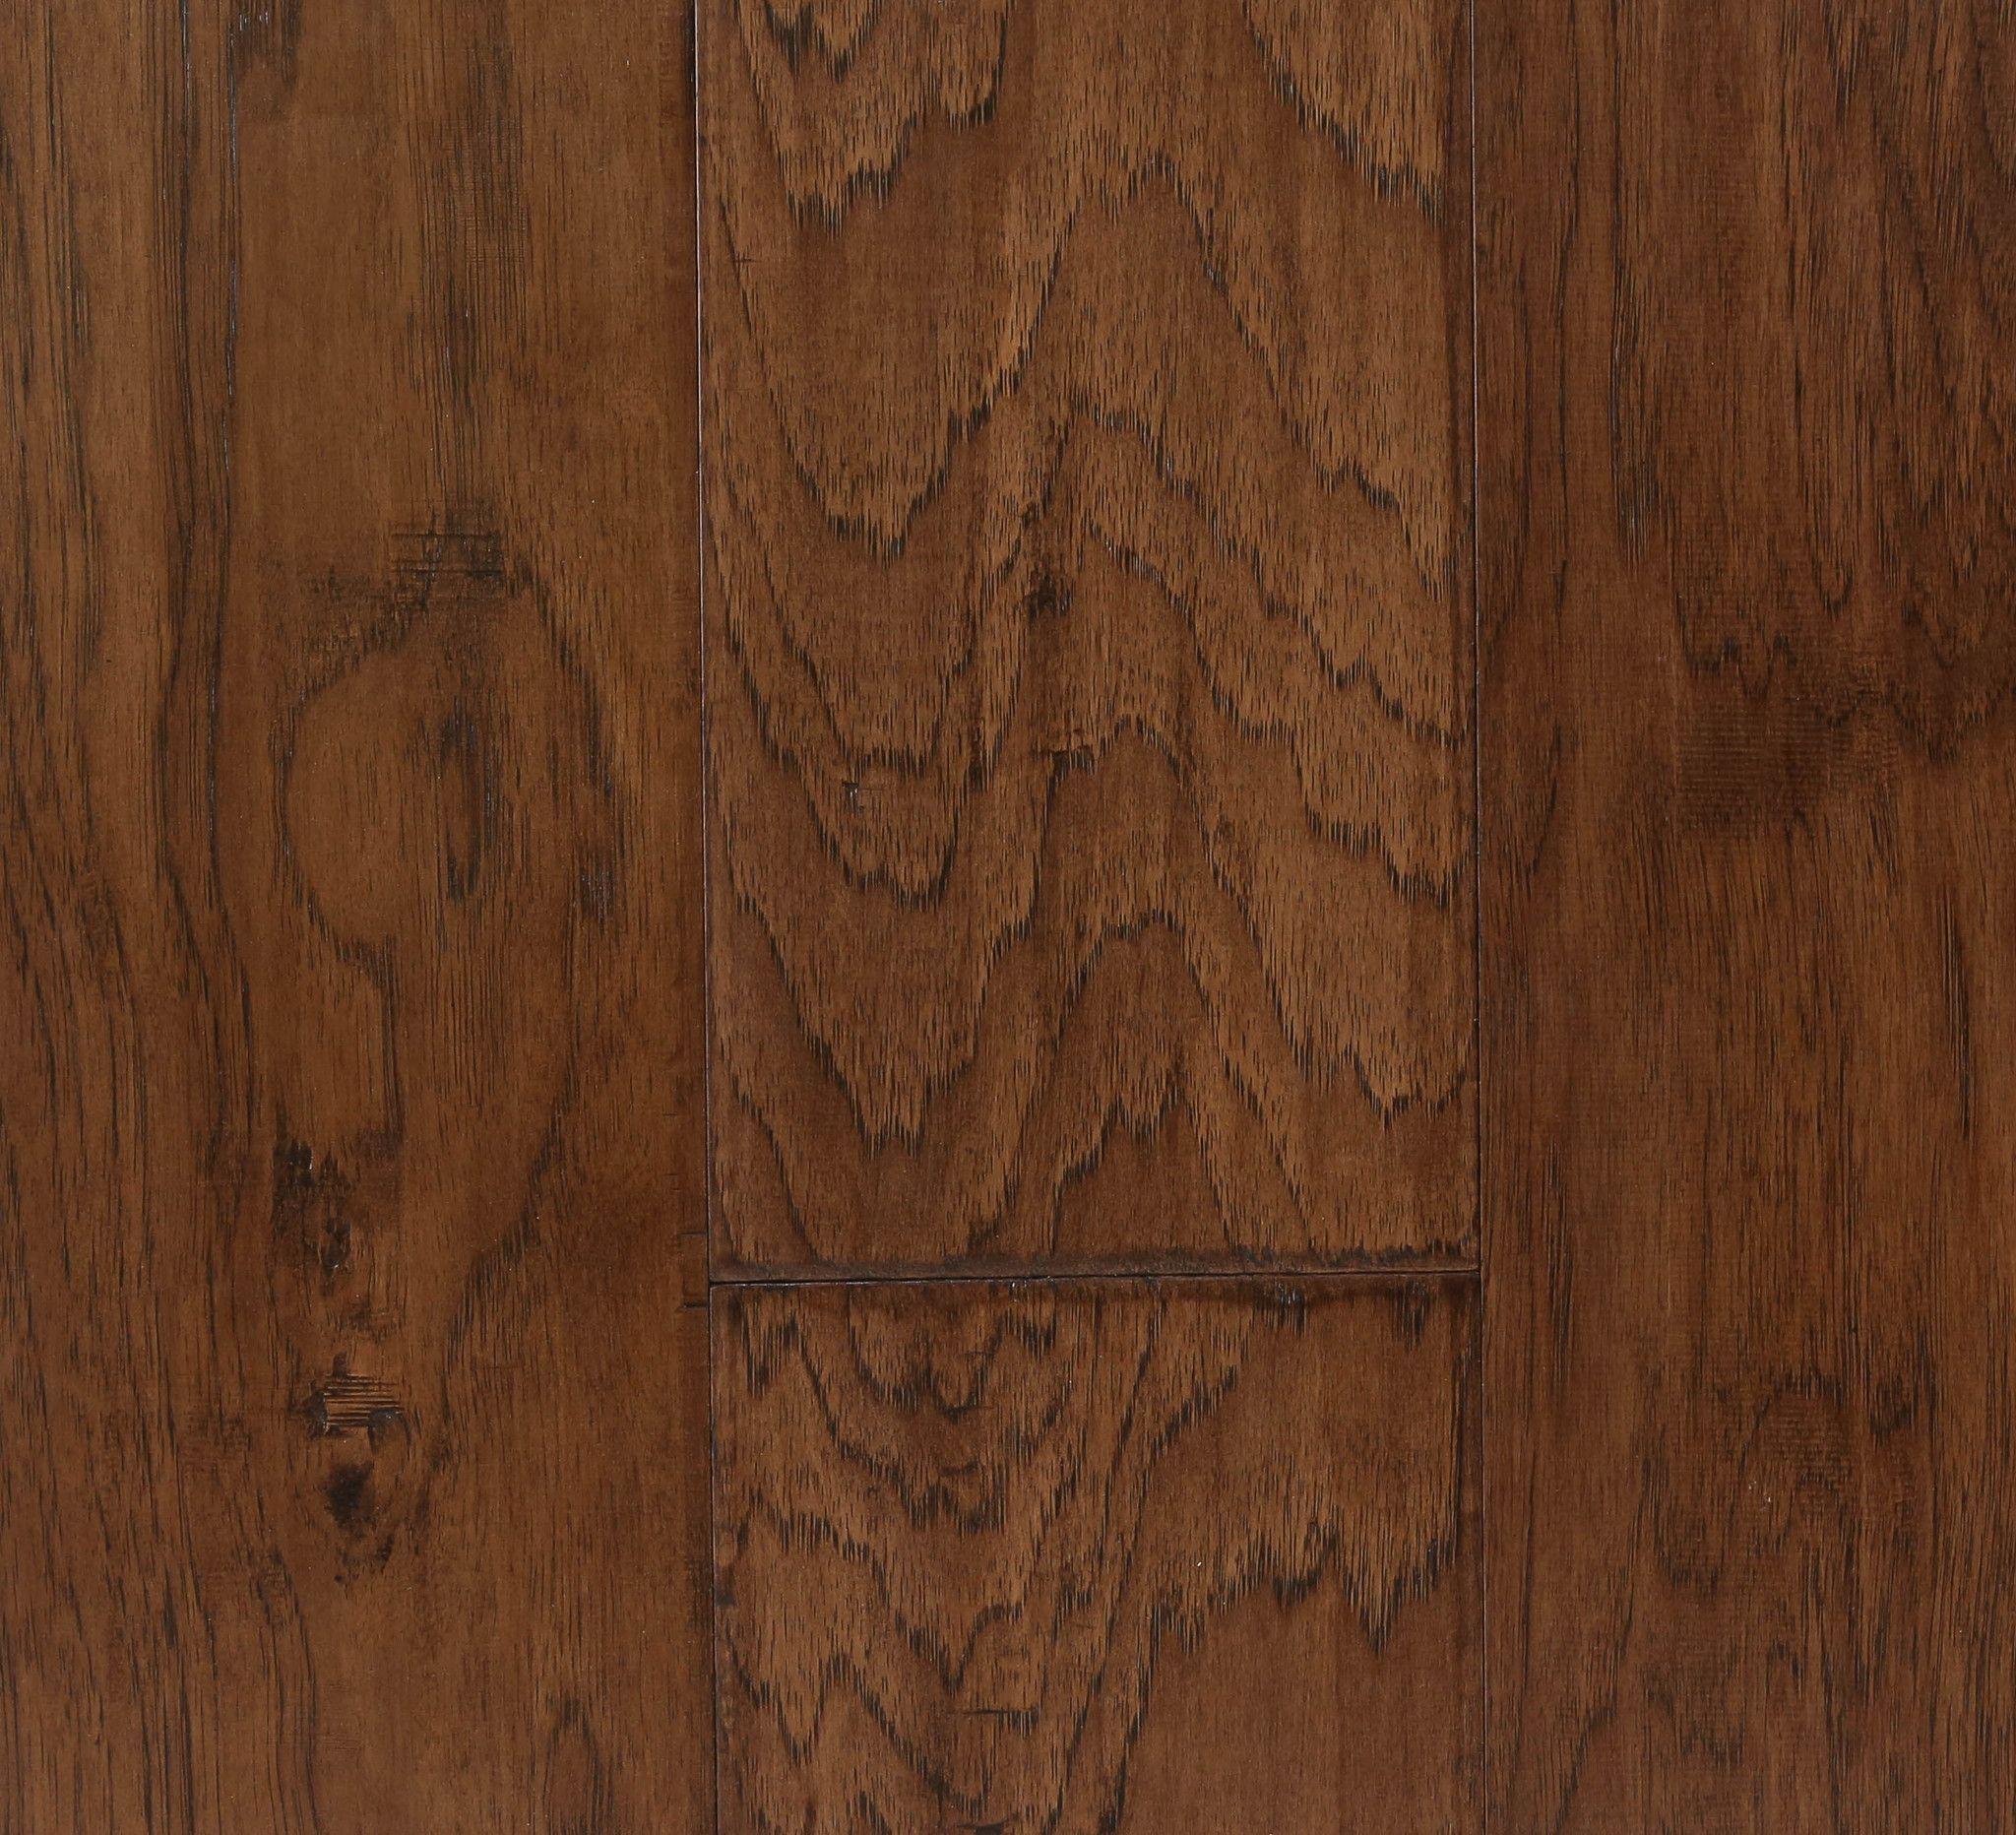 Michael Anthony Furniture Midland Hickory Series Pecan